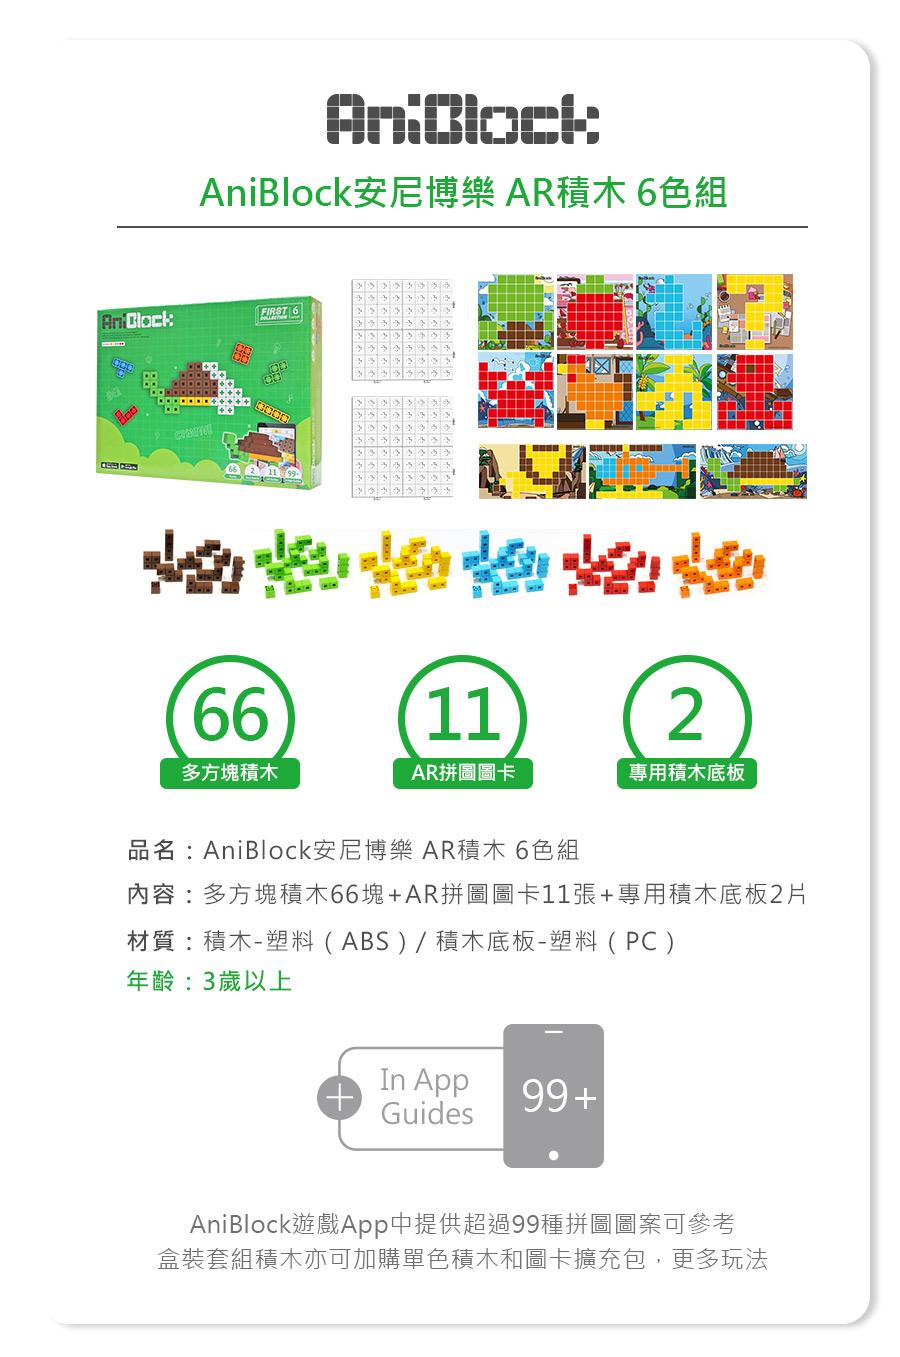 AniBlock AR積木拼圖 6色組 產品規格介紹